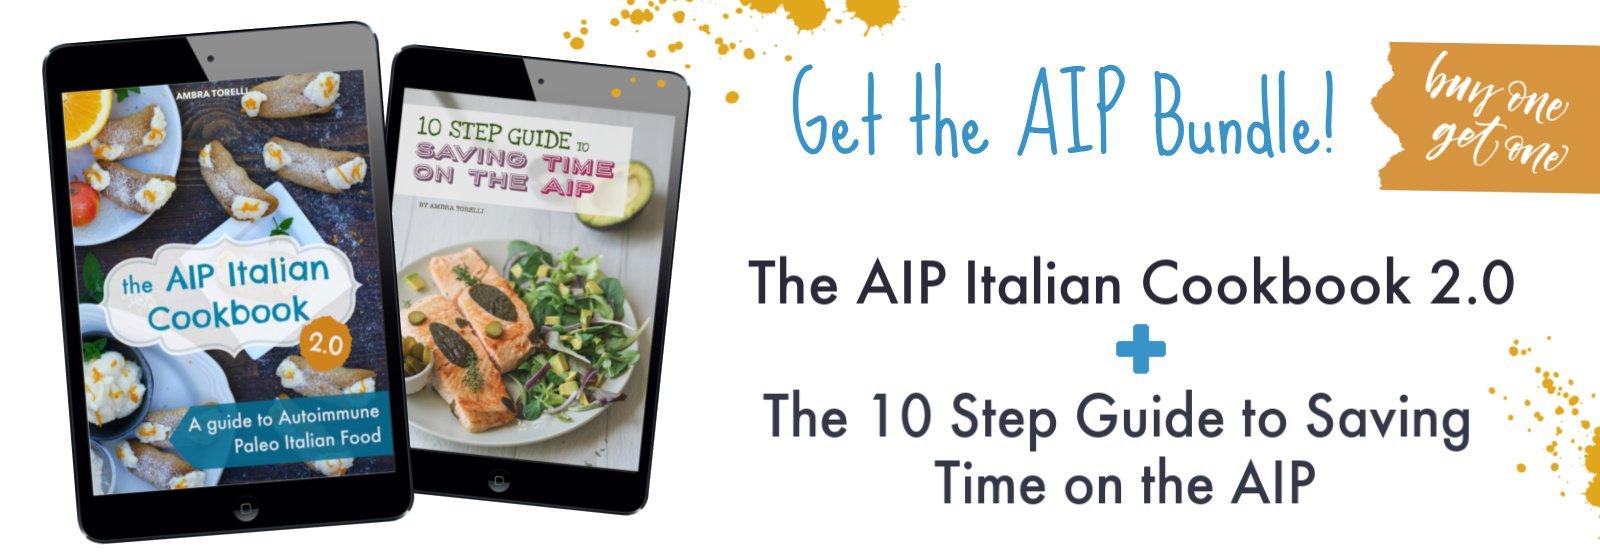 AIP Italian Food - The AIP Italian Cookbook